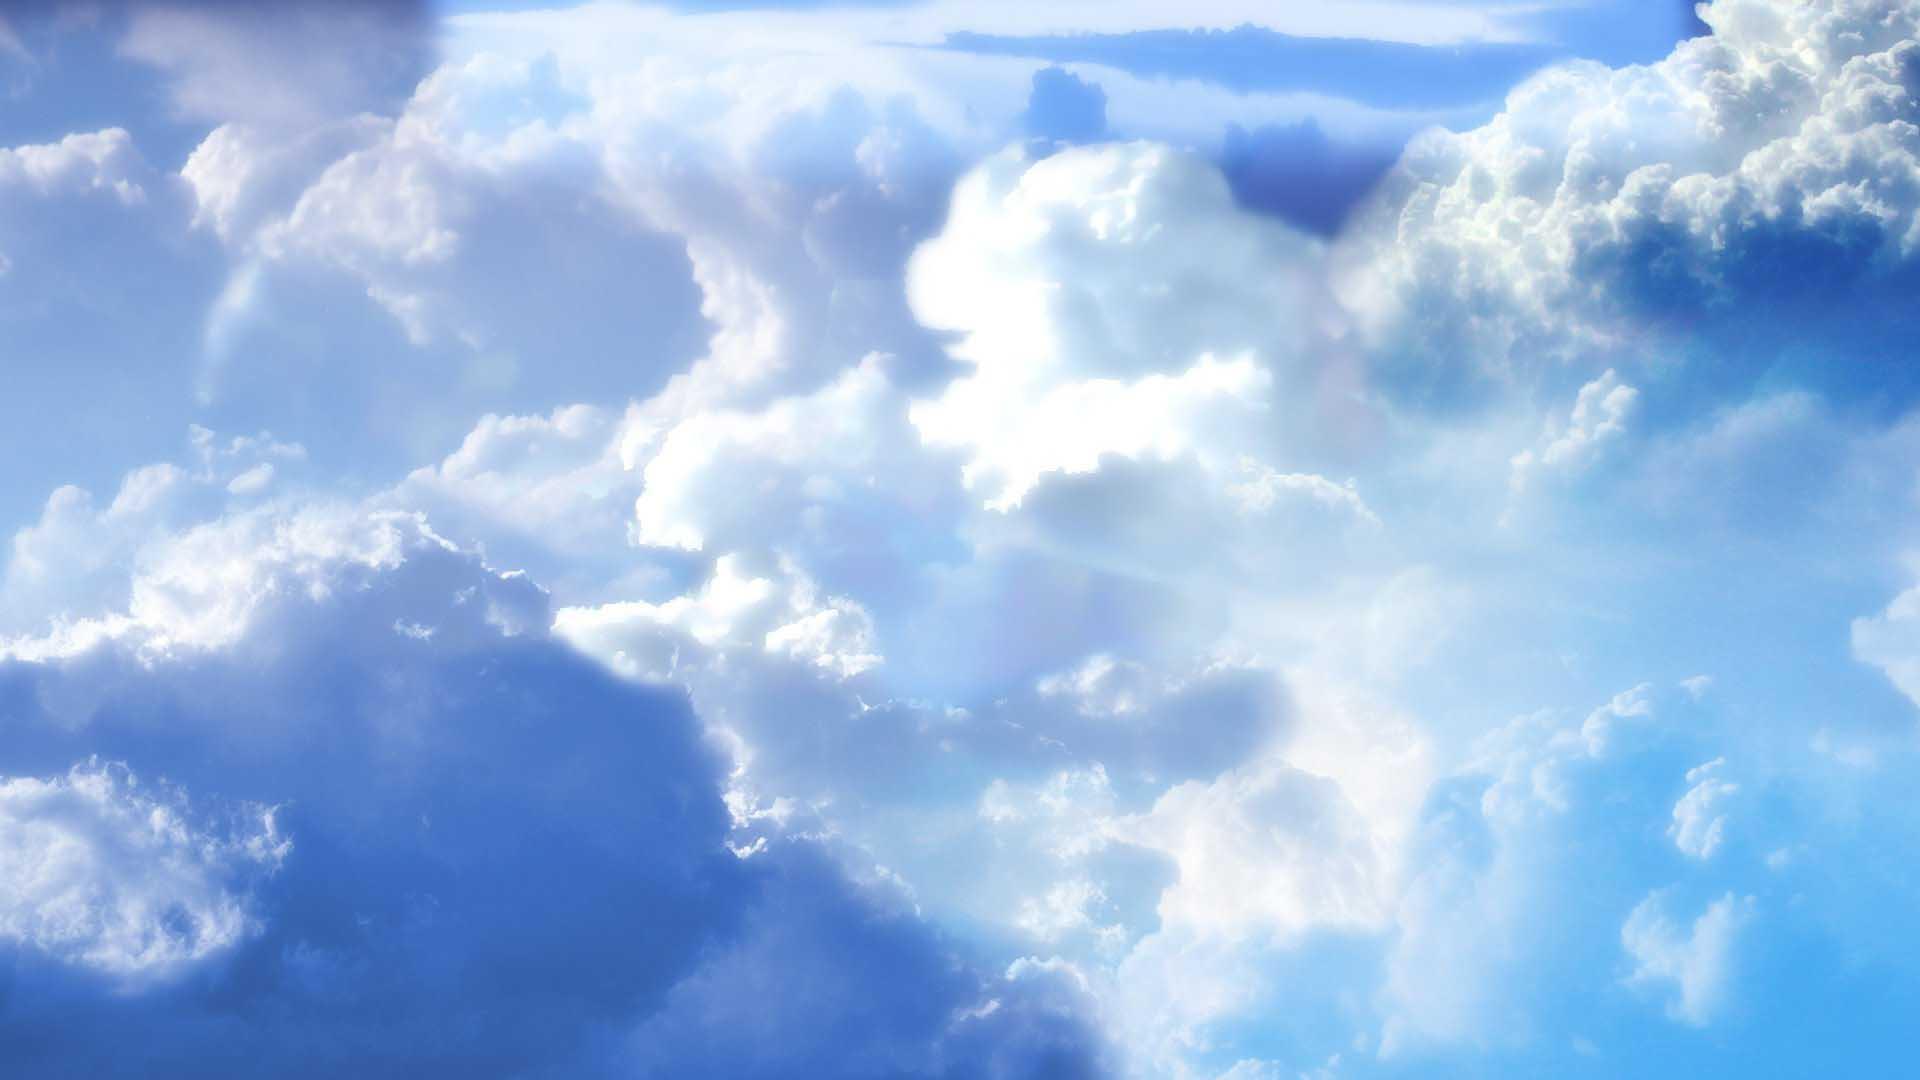 Heaven Background Wallpaper Wallpapersafari